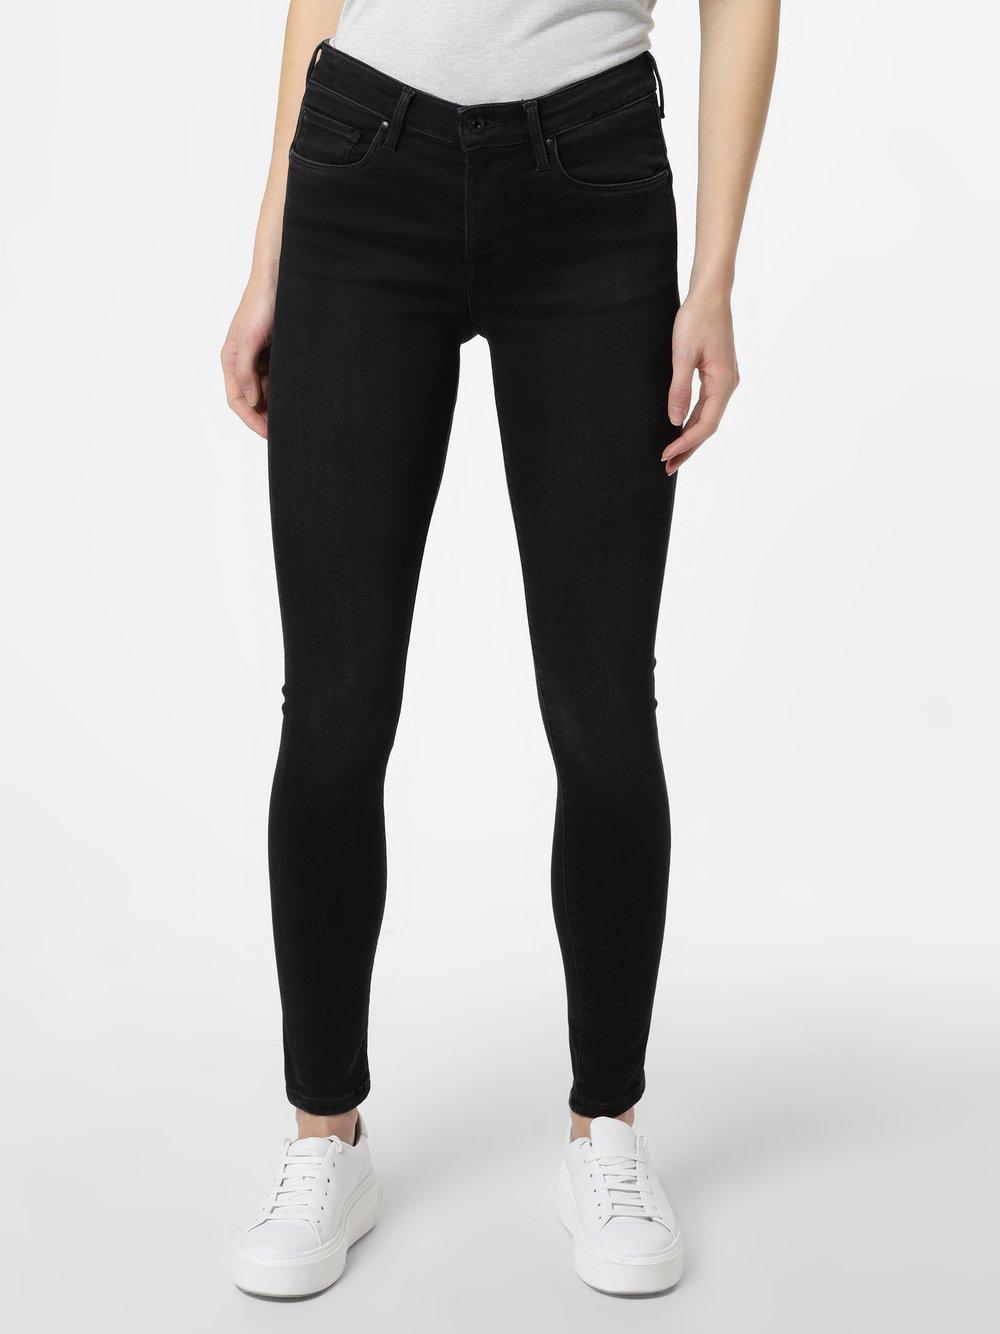 Pepe Jeans - Spodnie damskie – Zoe, czarny